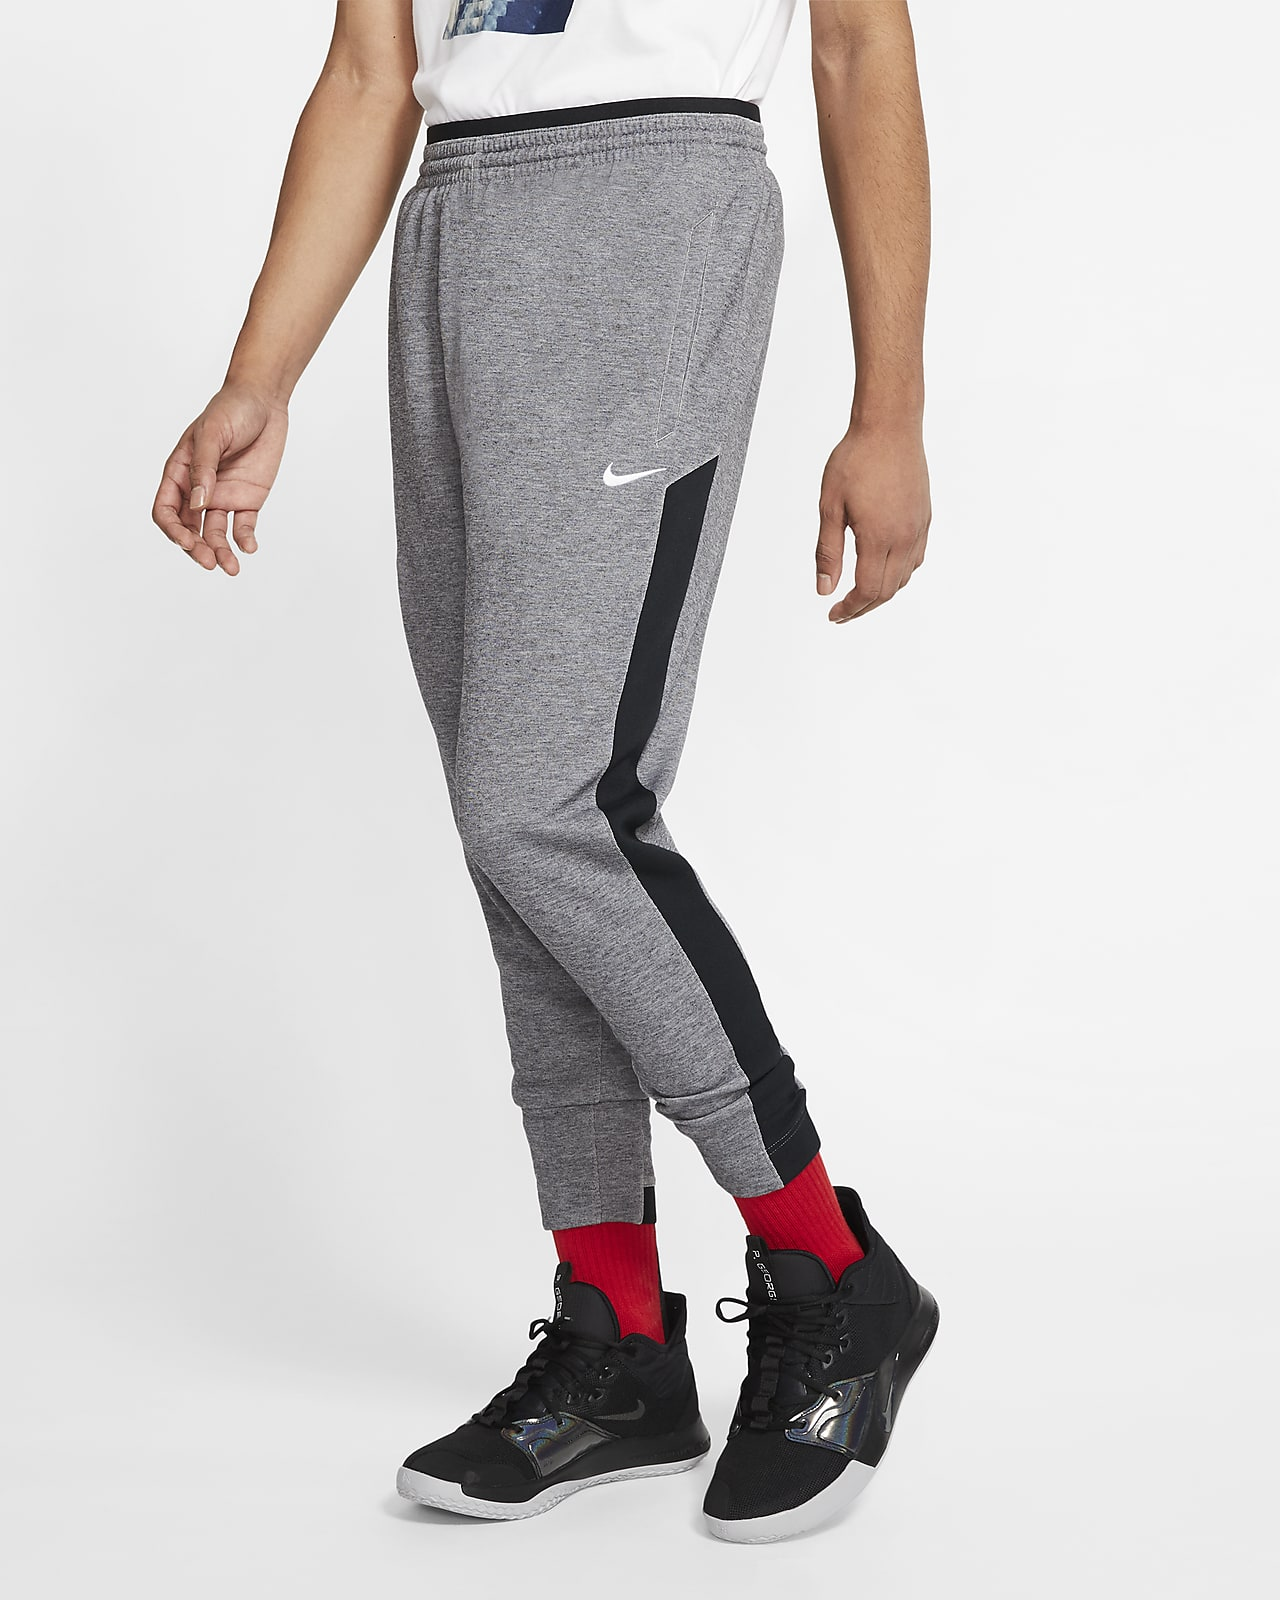 Nike Dri-FIT Showtime Men's Basketball Pants